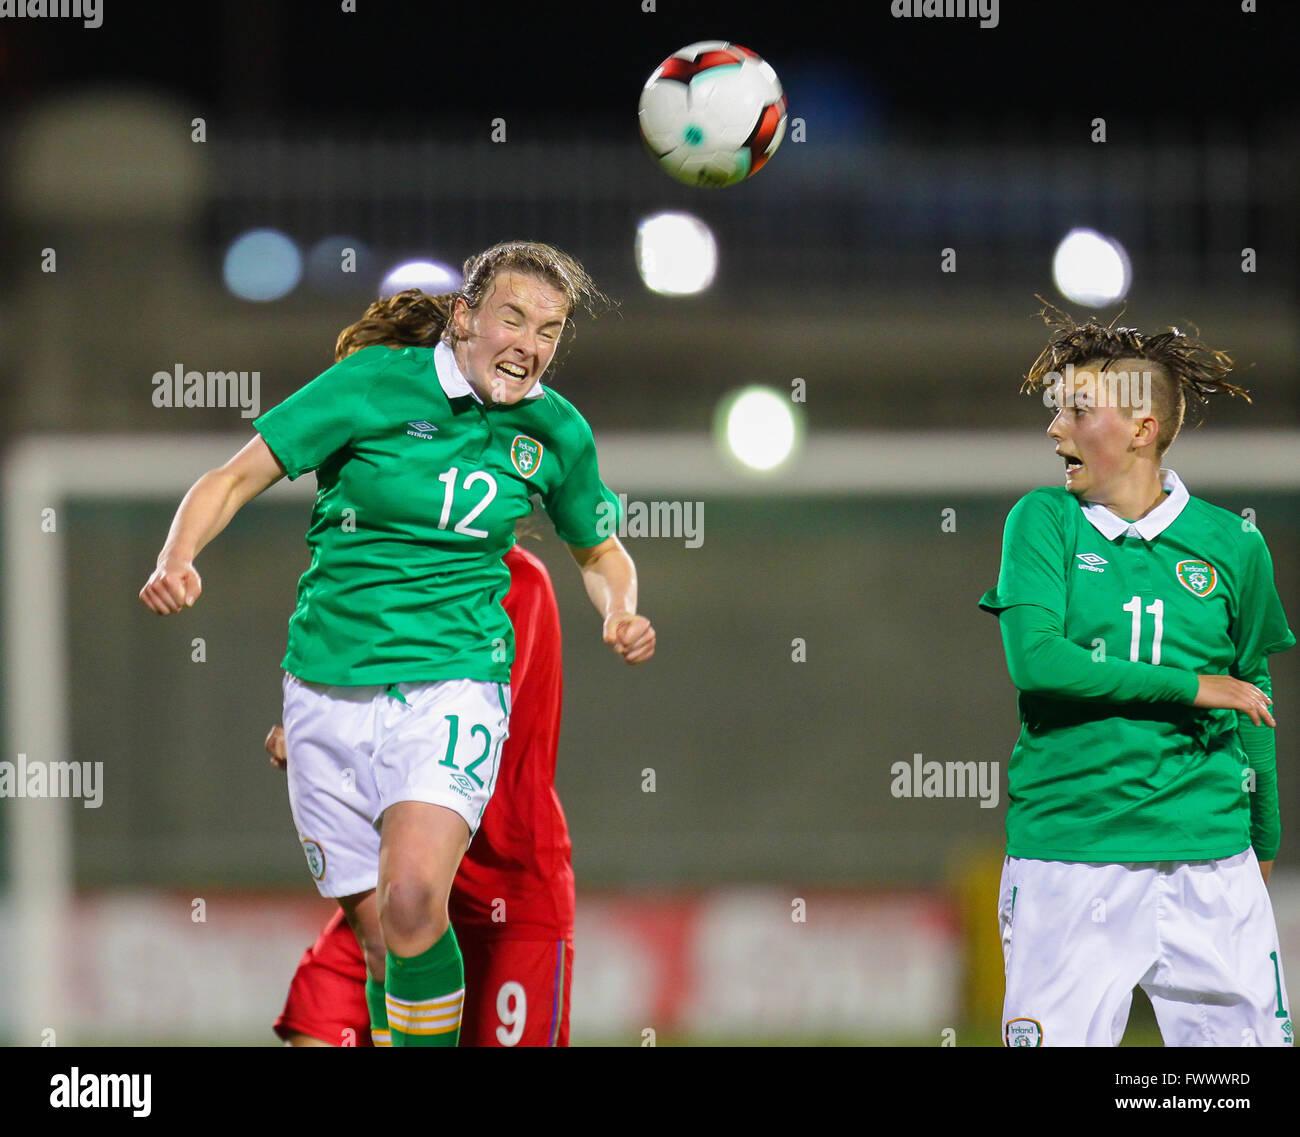 Dublin, Ireland. 7th April, 2016. Lucy McCartan of Ireland U19 wins the header, Ireland Women U19 v Azerbaijan Women - Stock Image